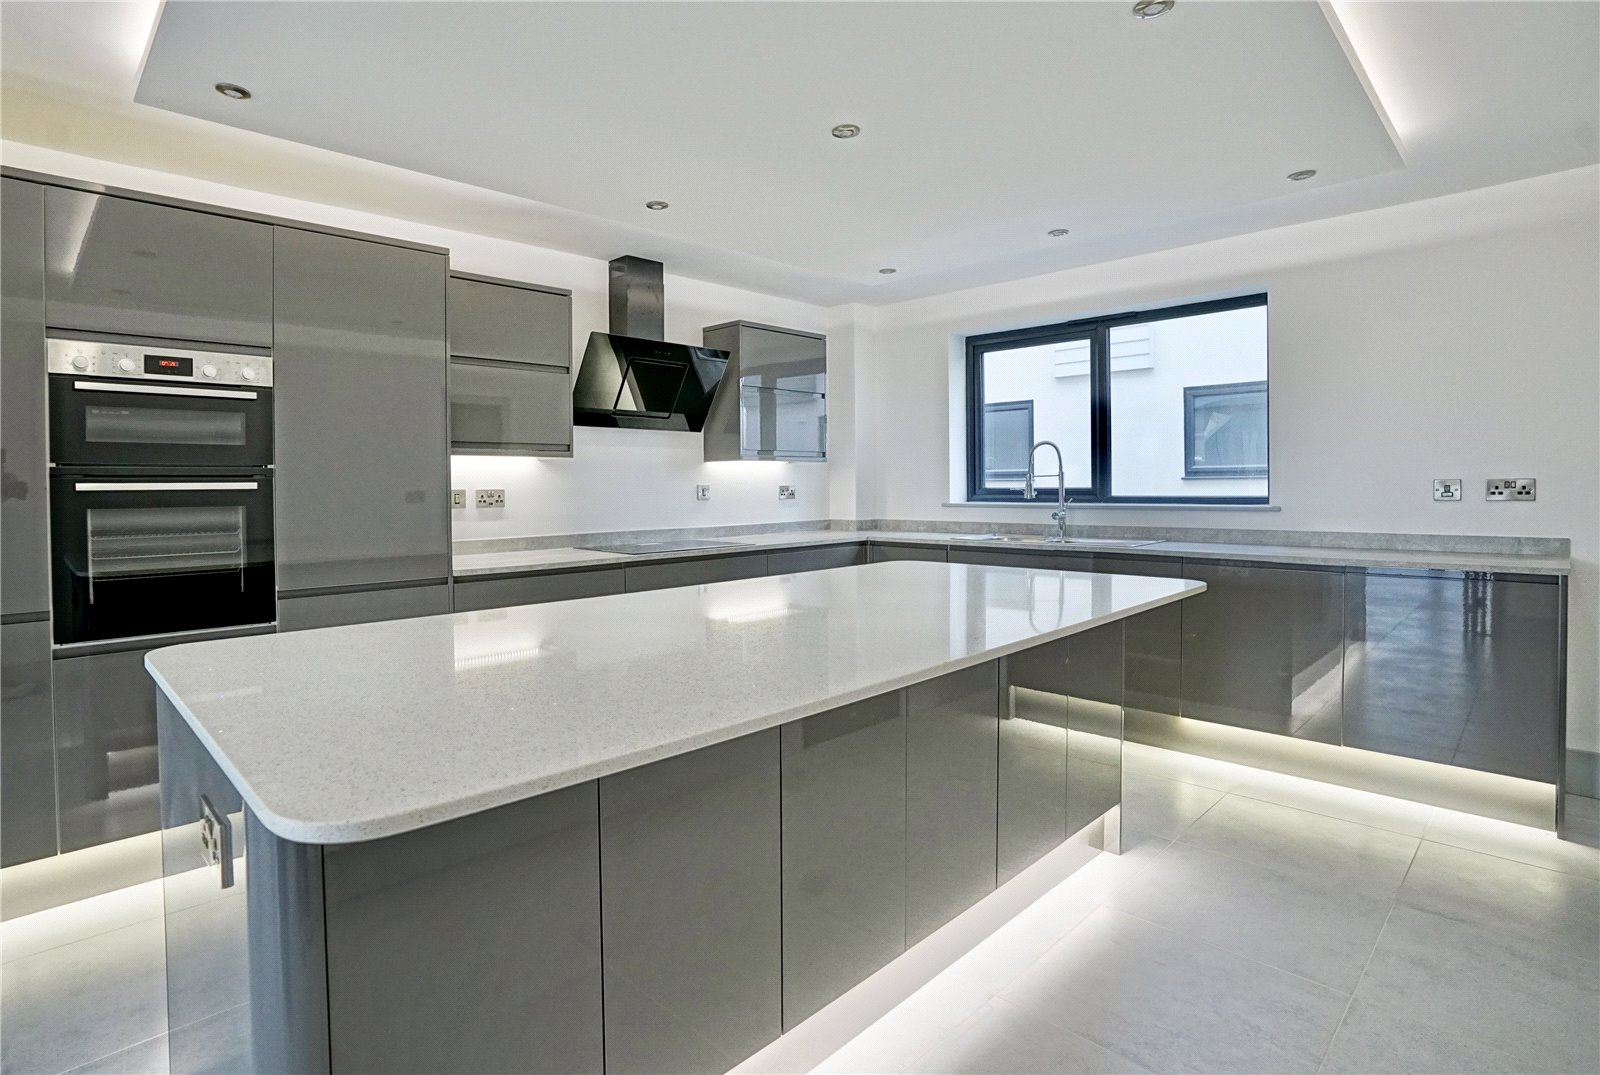 5 bed house for sale in Eynesbury Hardwicke  - Property Image 3